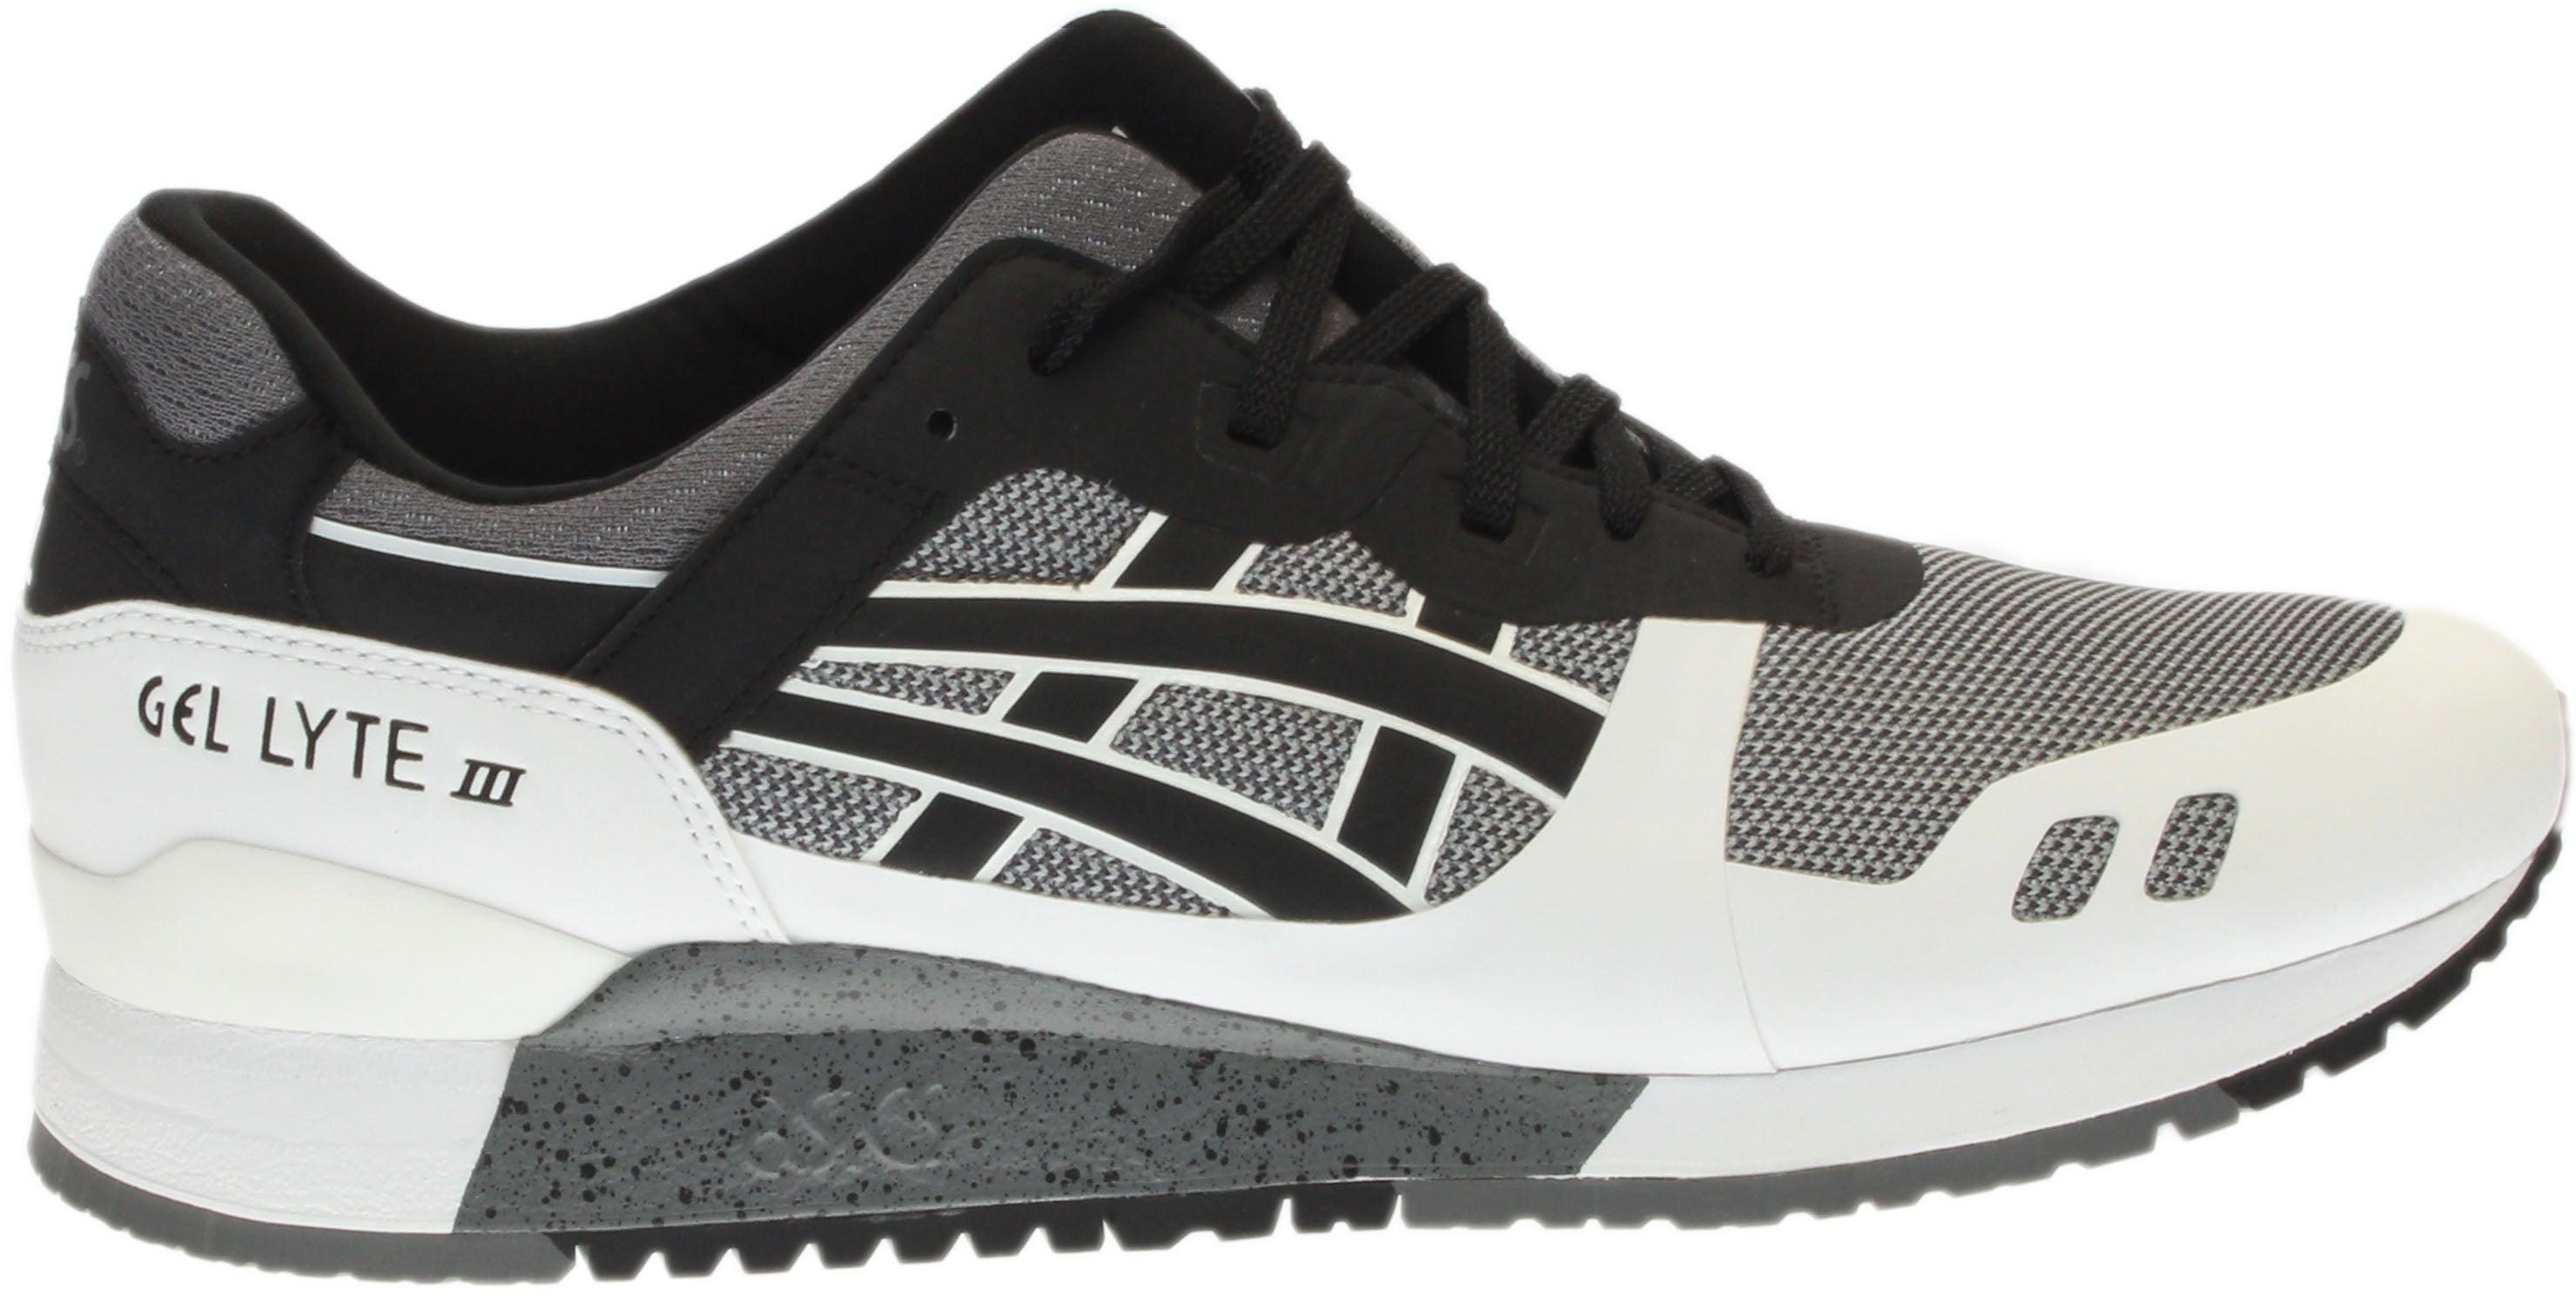 4a0f12733b88 ASICS GEL-Lyte III NS Running Shoes - Black White - Mens